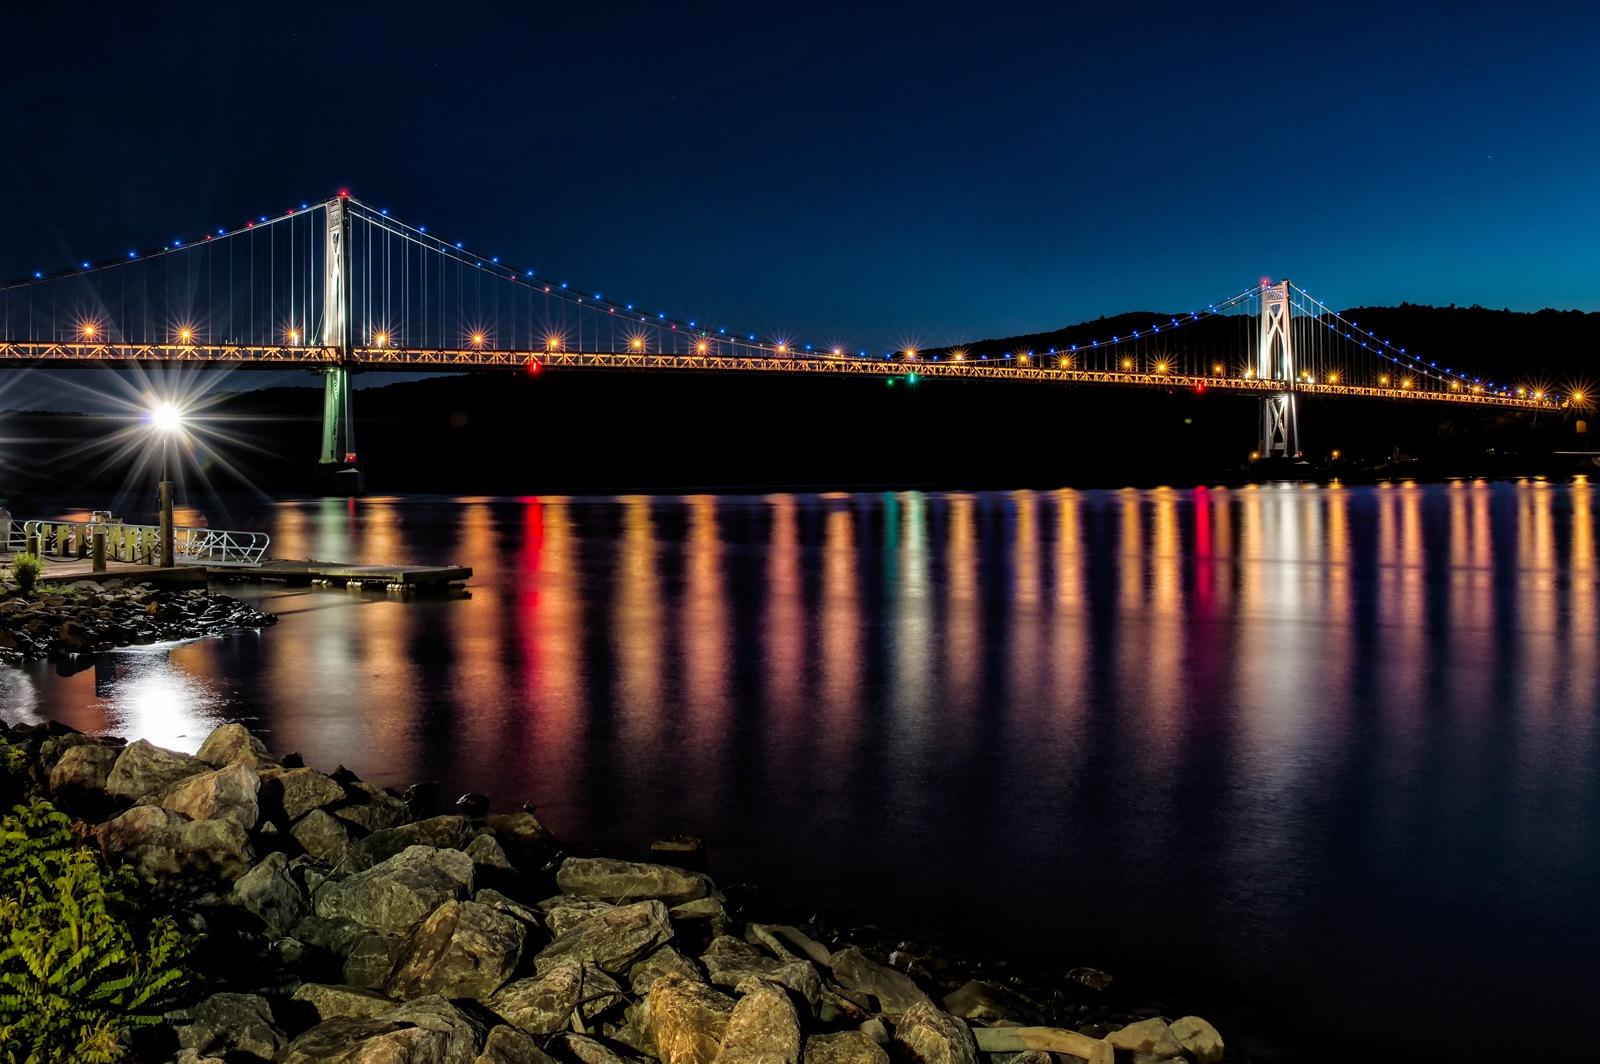 Mid-Hudson Bridge after Sunset by Philip Haber